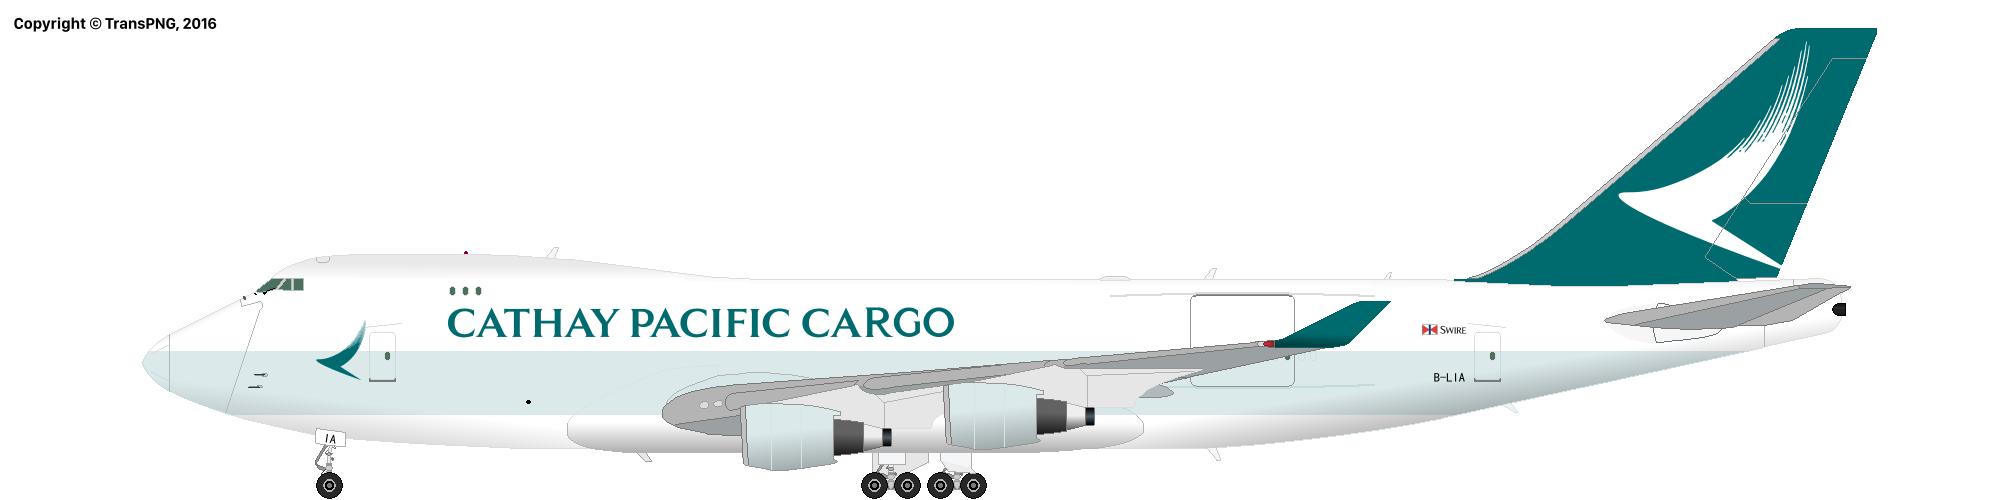 Airplane 6208